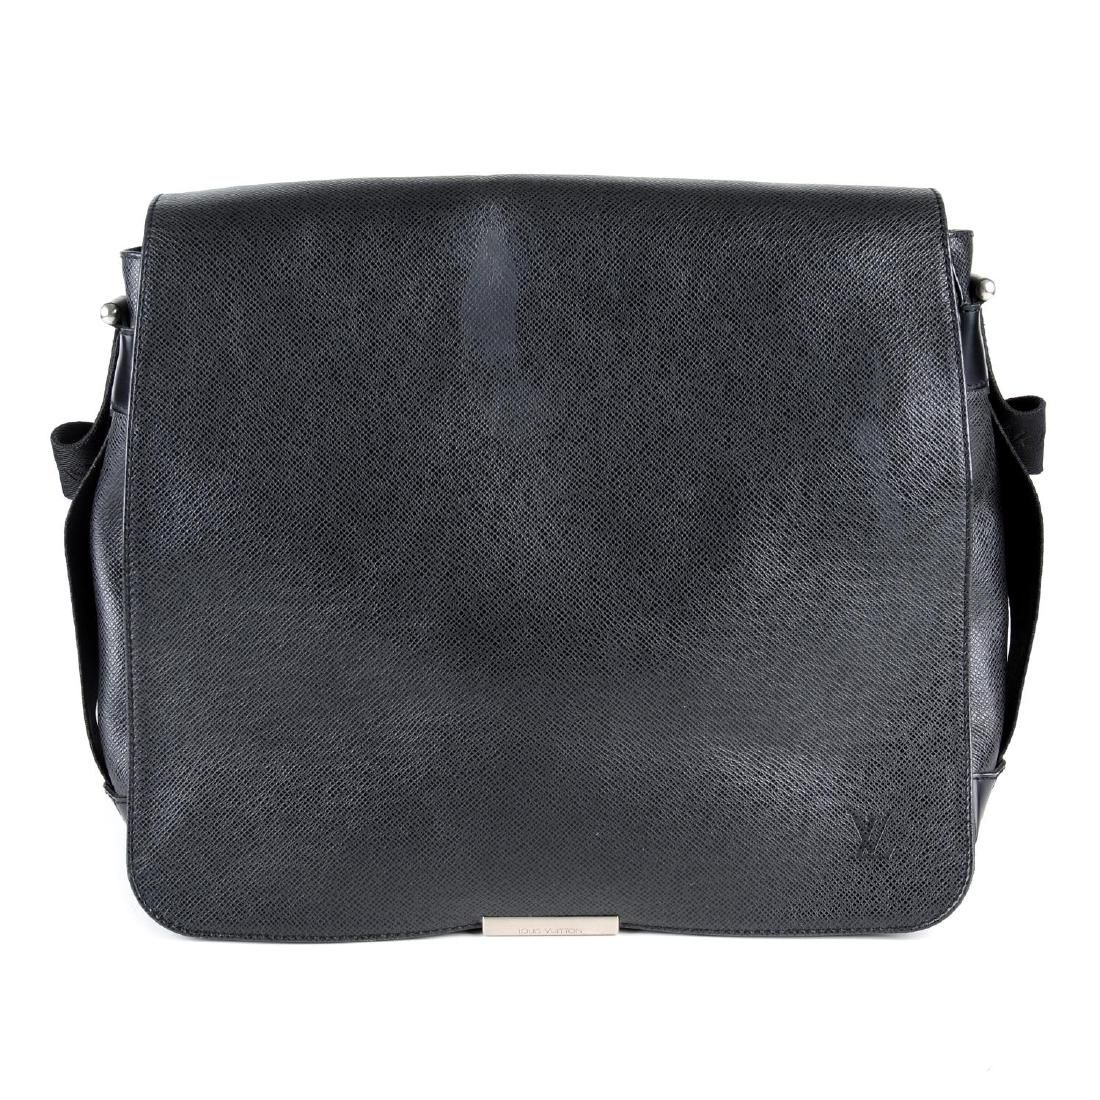 LOUIS VUITTON - a Taiga Viktor messenger bag. Crafted